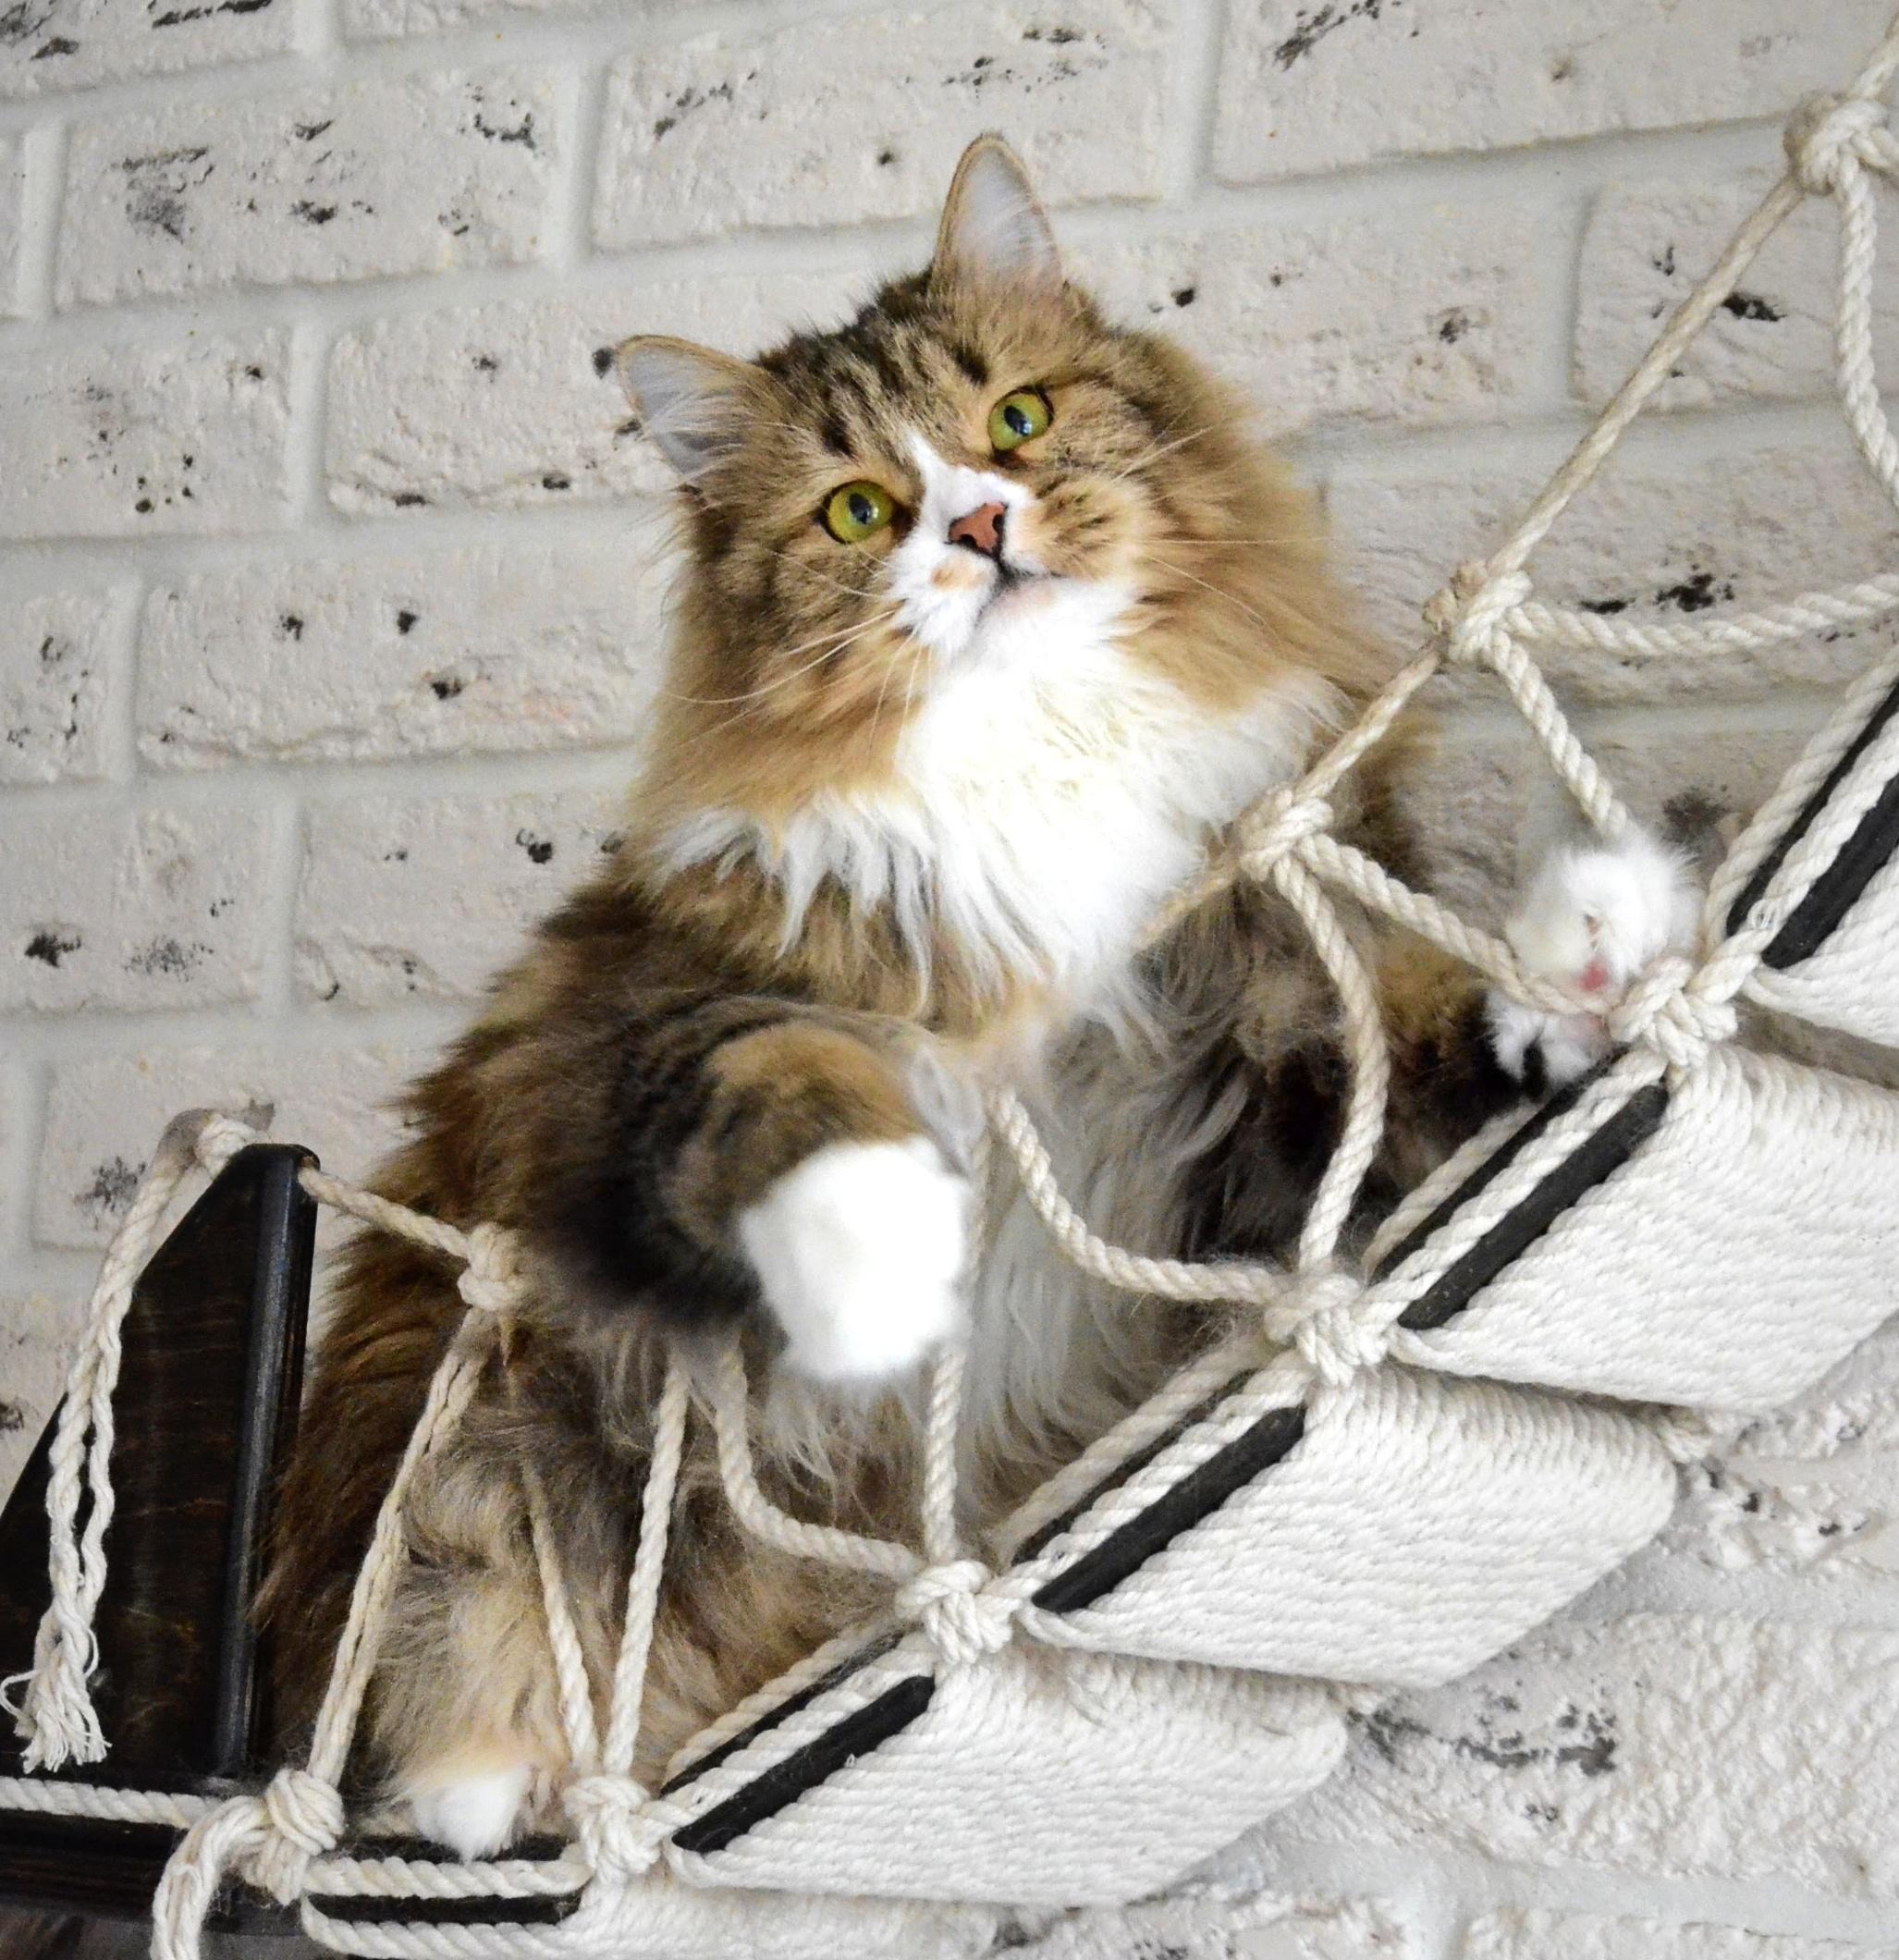 cats07.02.21 137-01